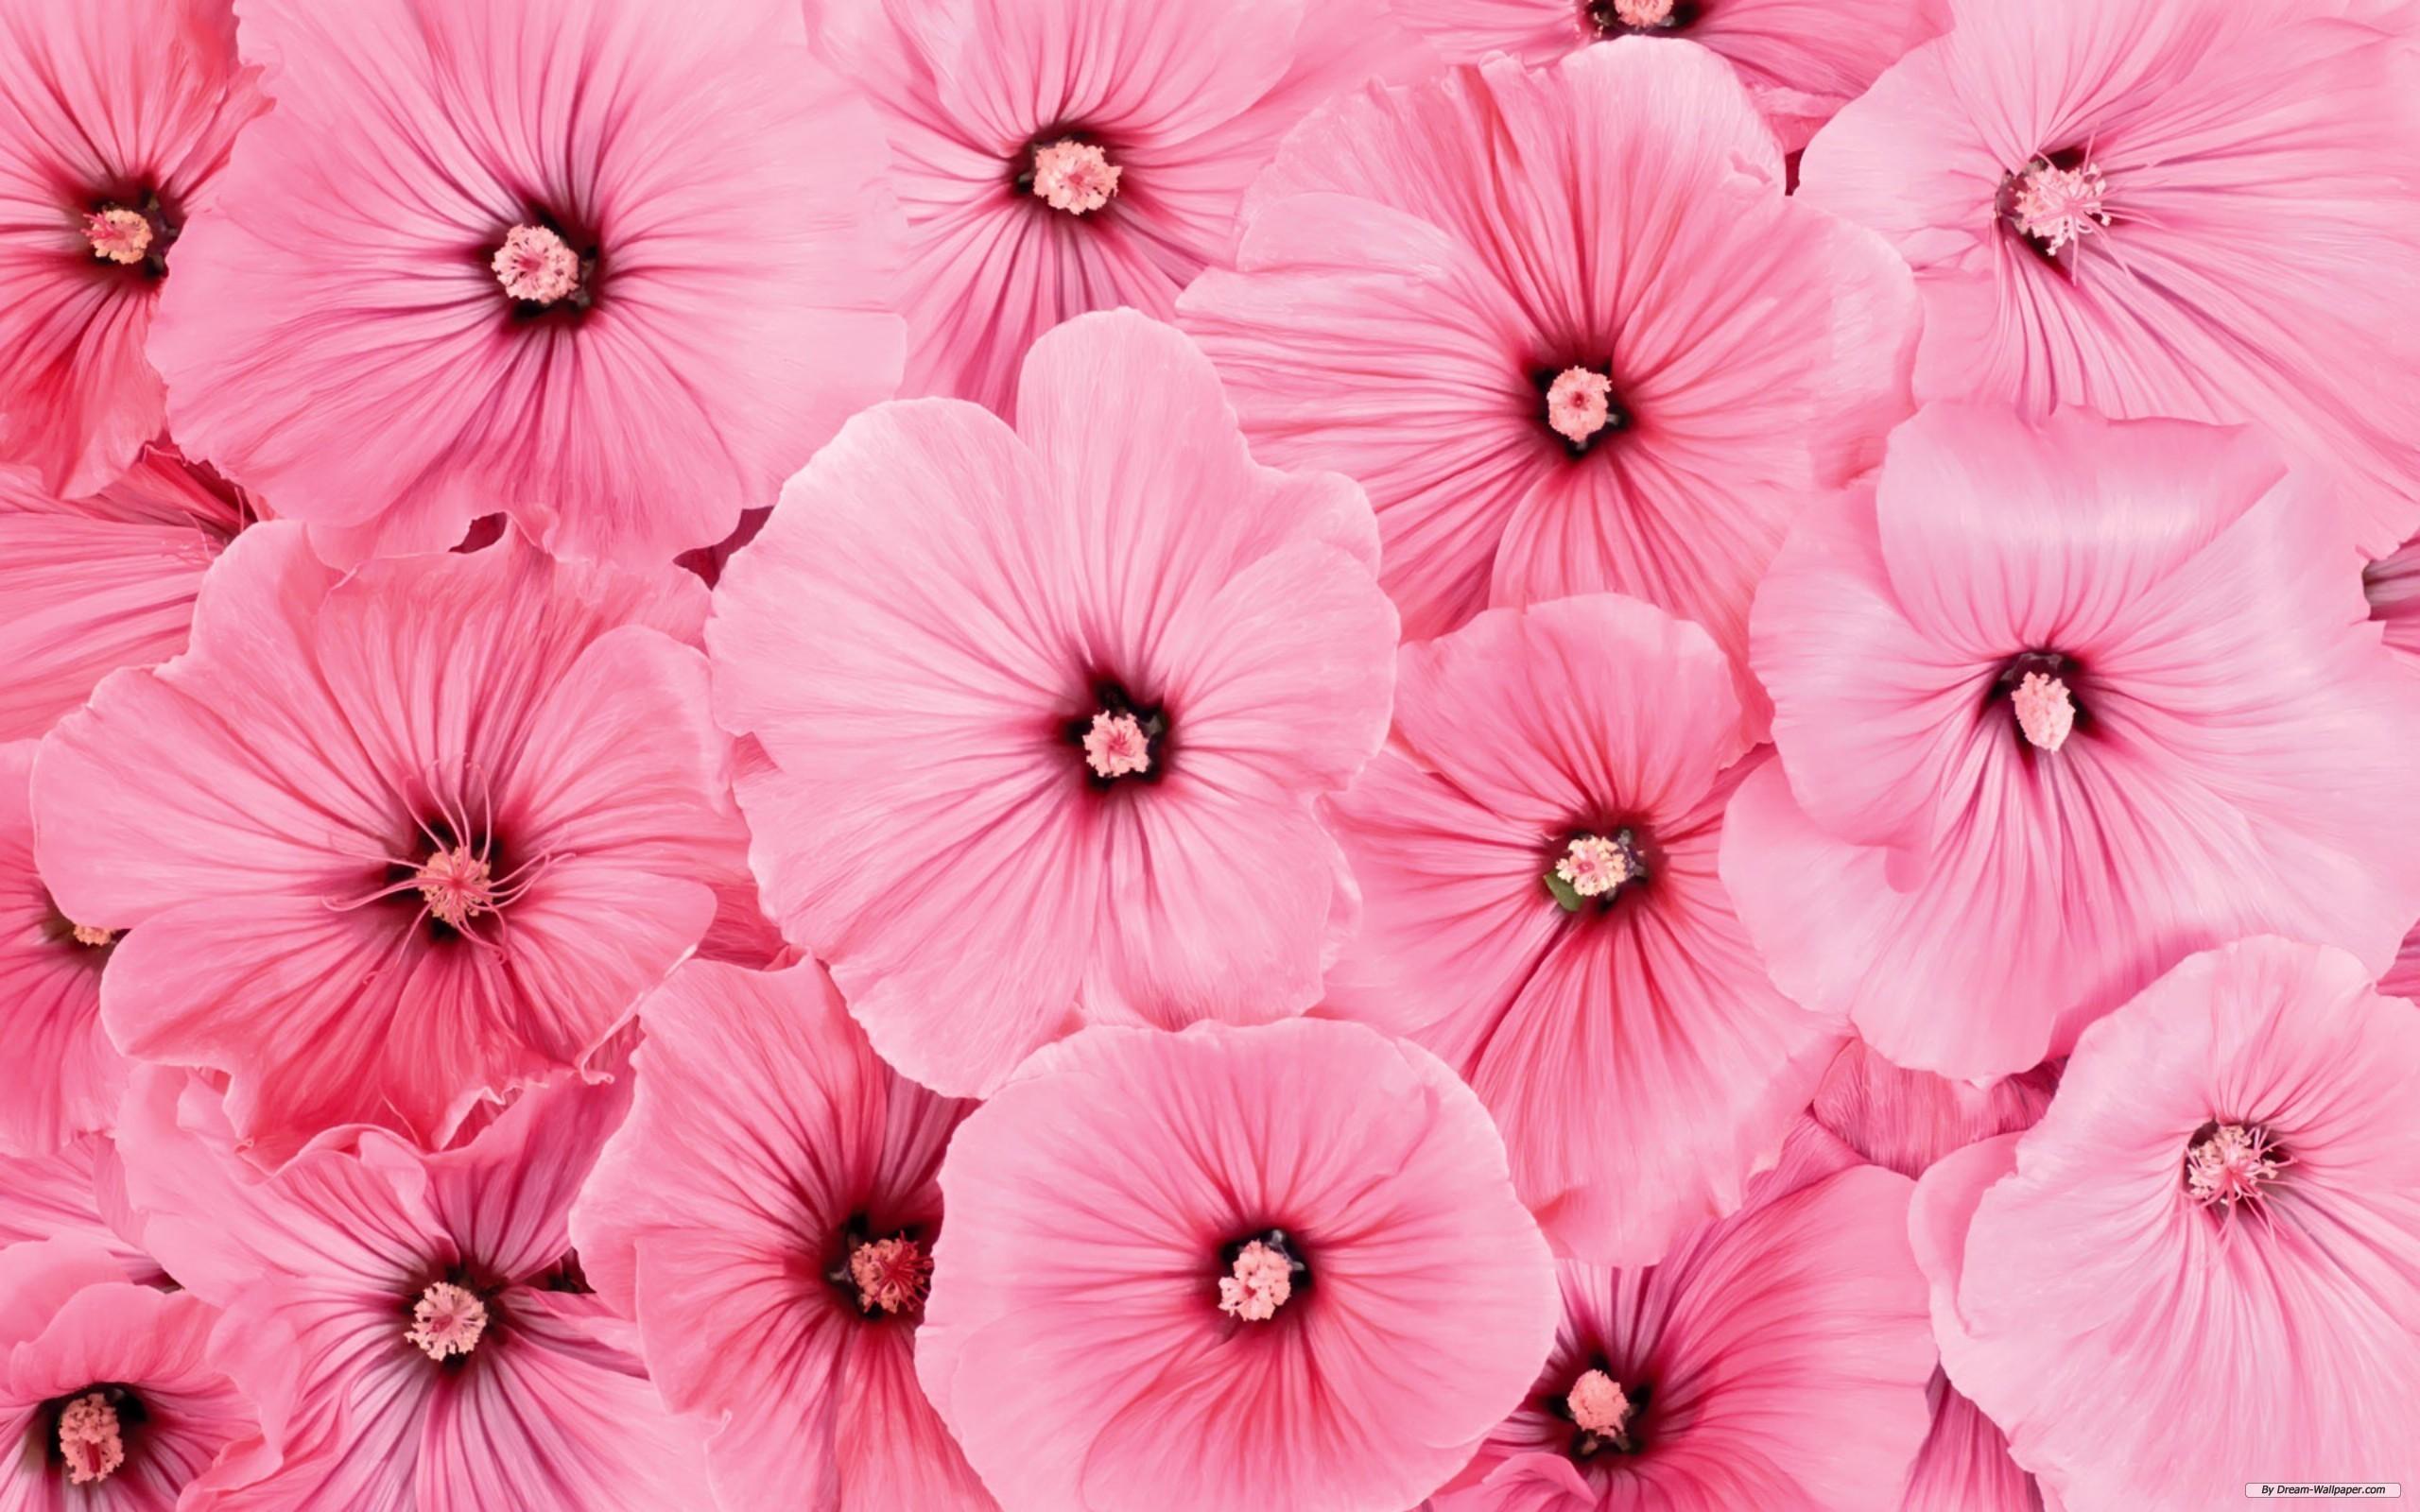 Pink hd wallpaper 81 images 1920x1200 pink flowers hd wallpapers free wallpaper mightylinksfo